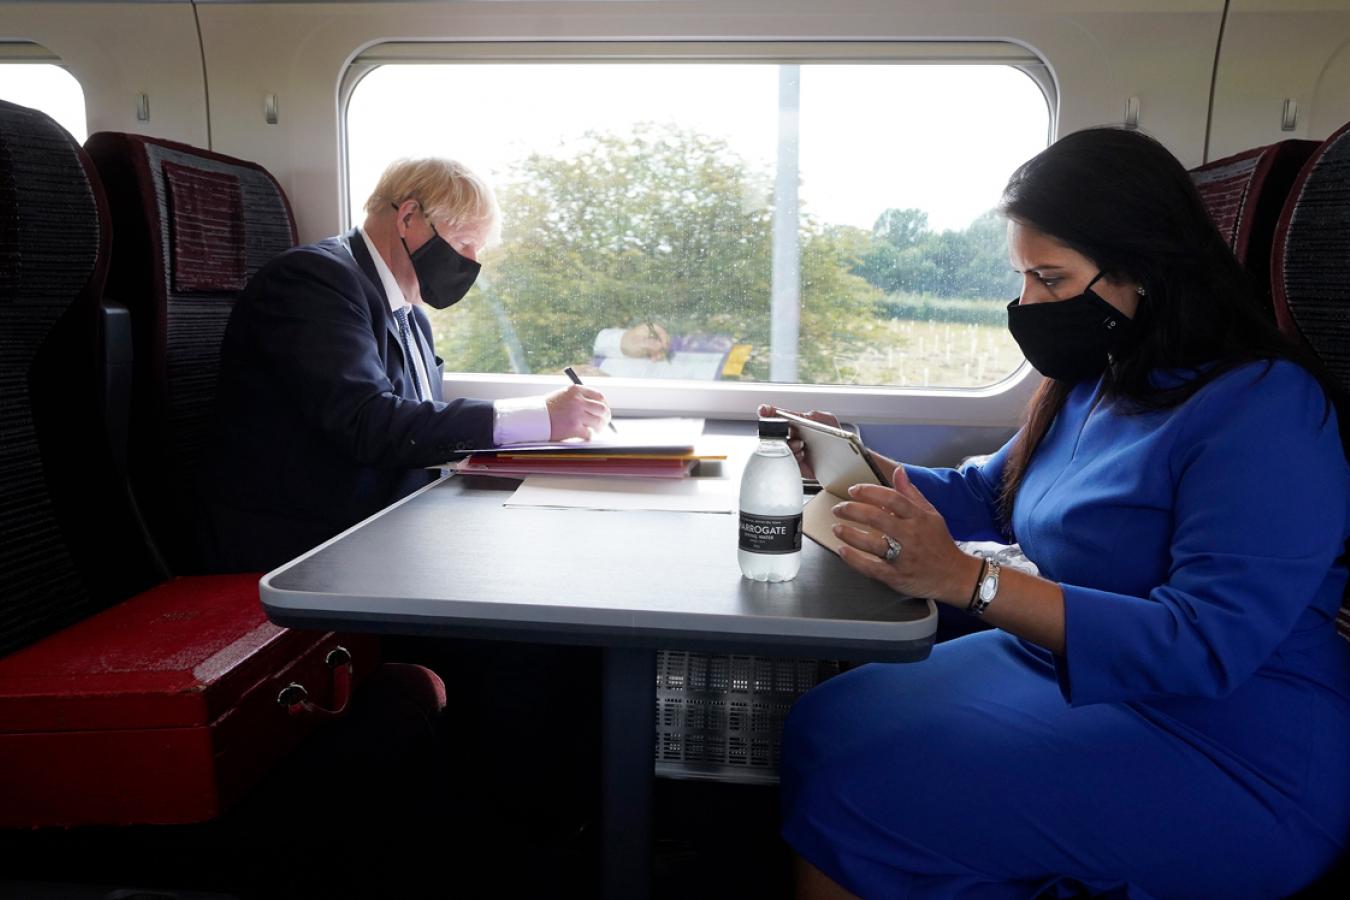 Boris Johnson and Priti Patel working on the Train